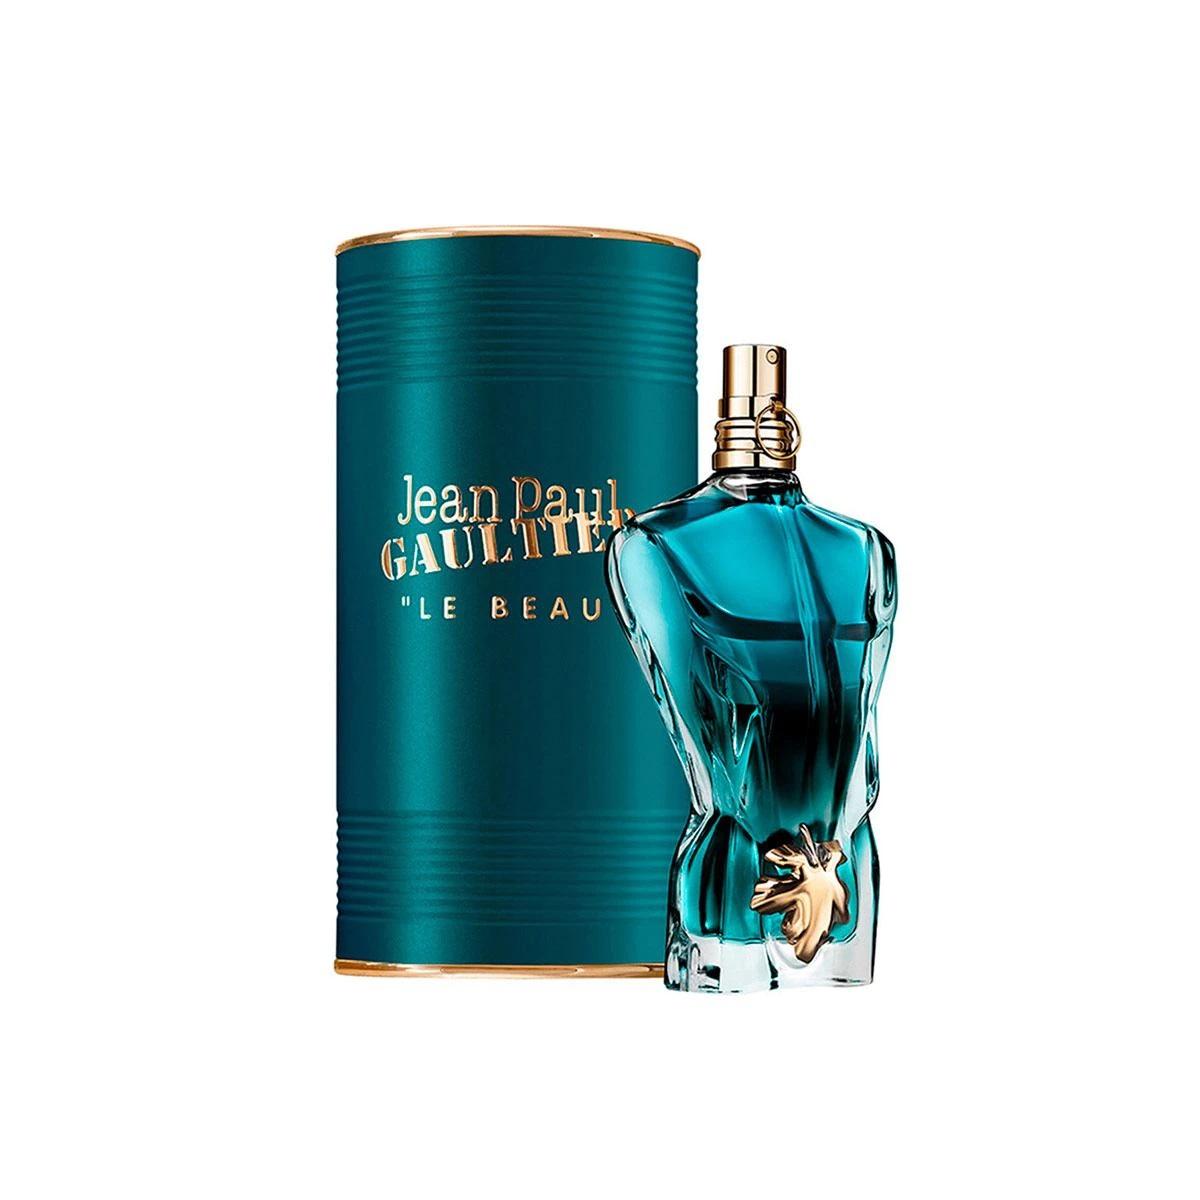 Perfume Jean Paul Gaultter Le Beau Eau Toil 125 Ml Caballero